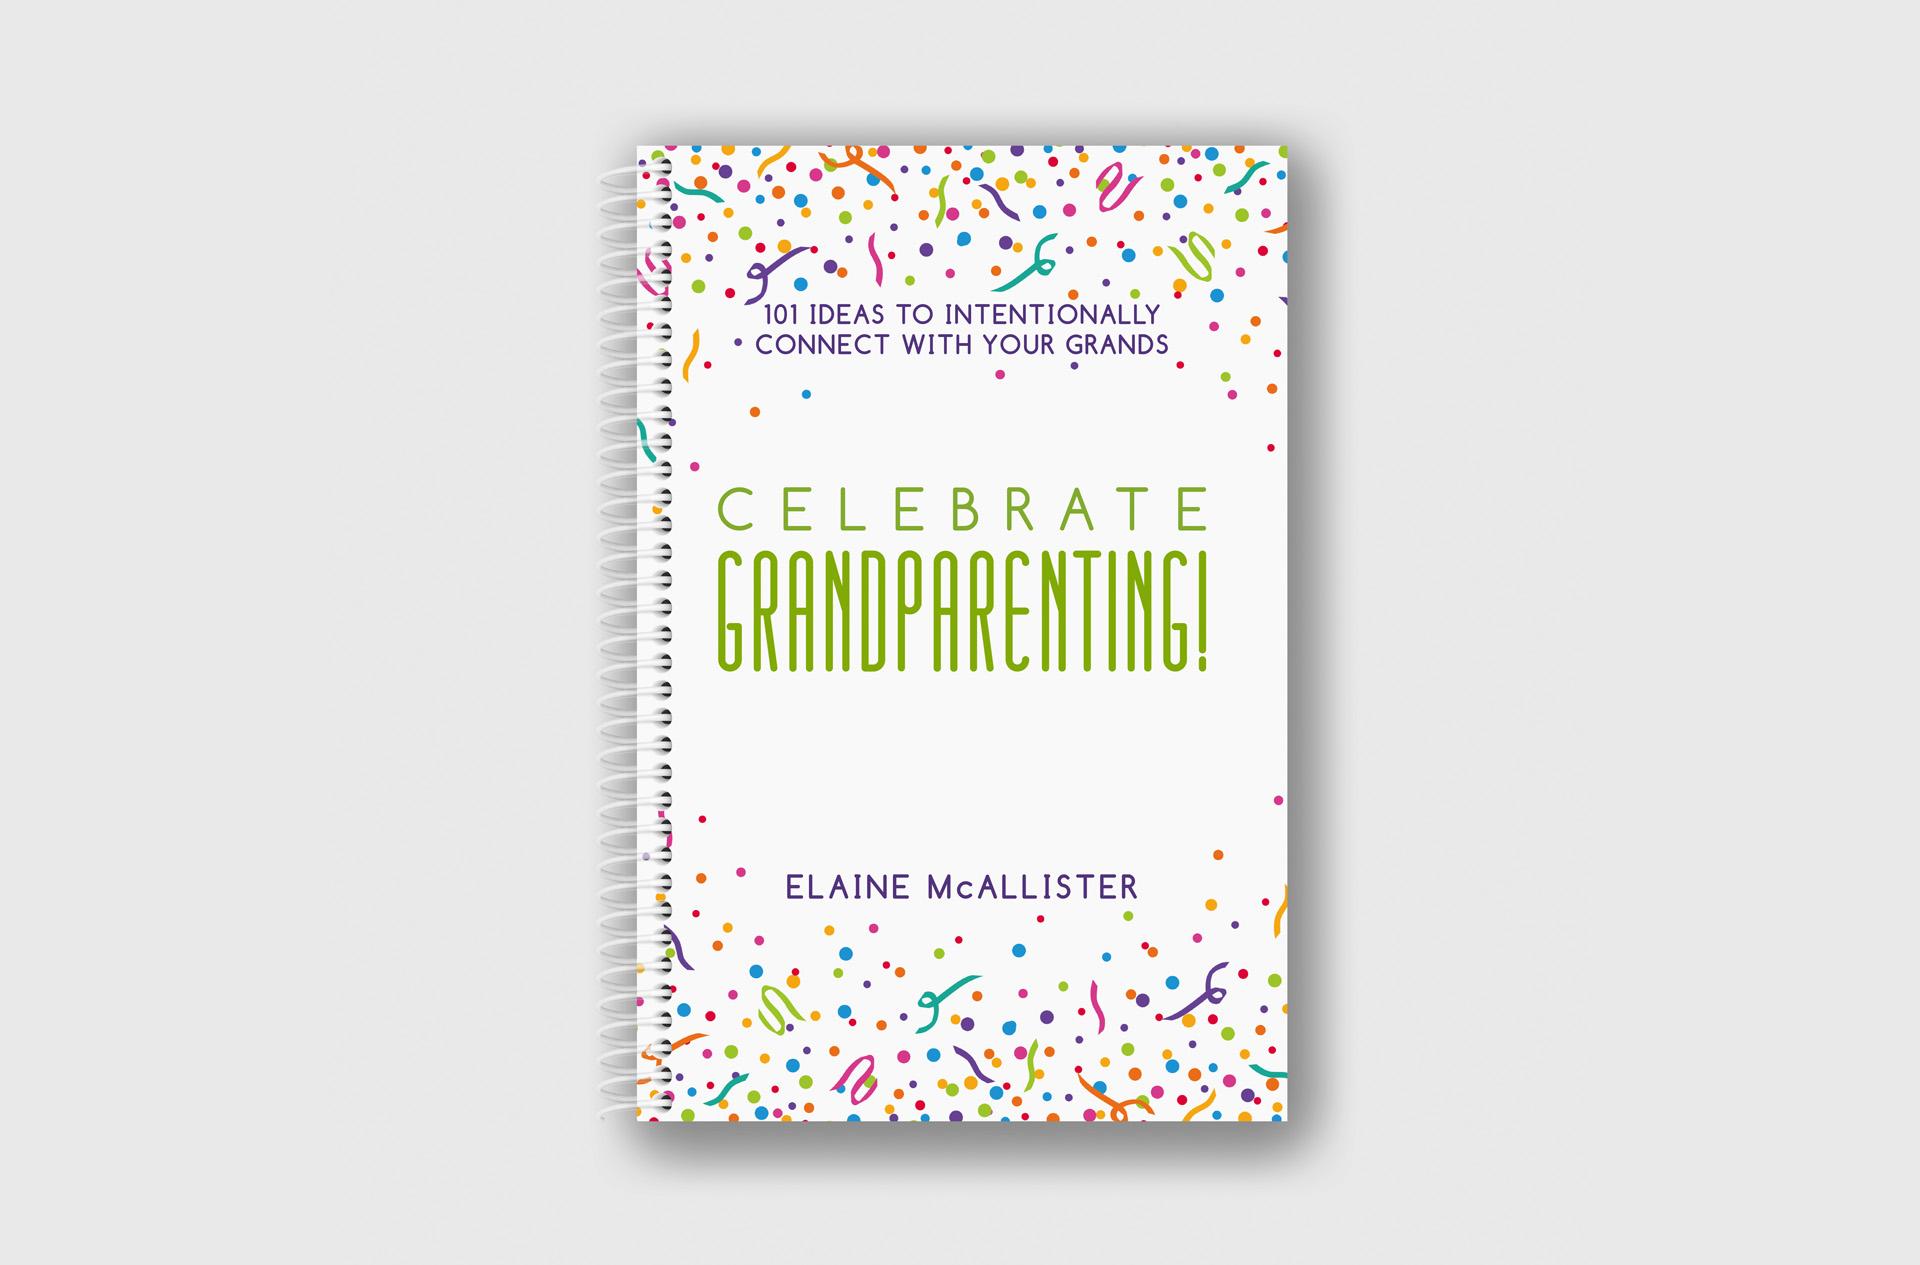 Celebrate Grandparenting by Elaine McAllister Book Cover Design